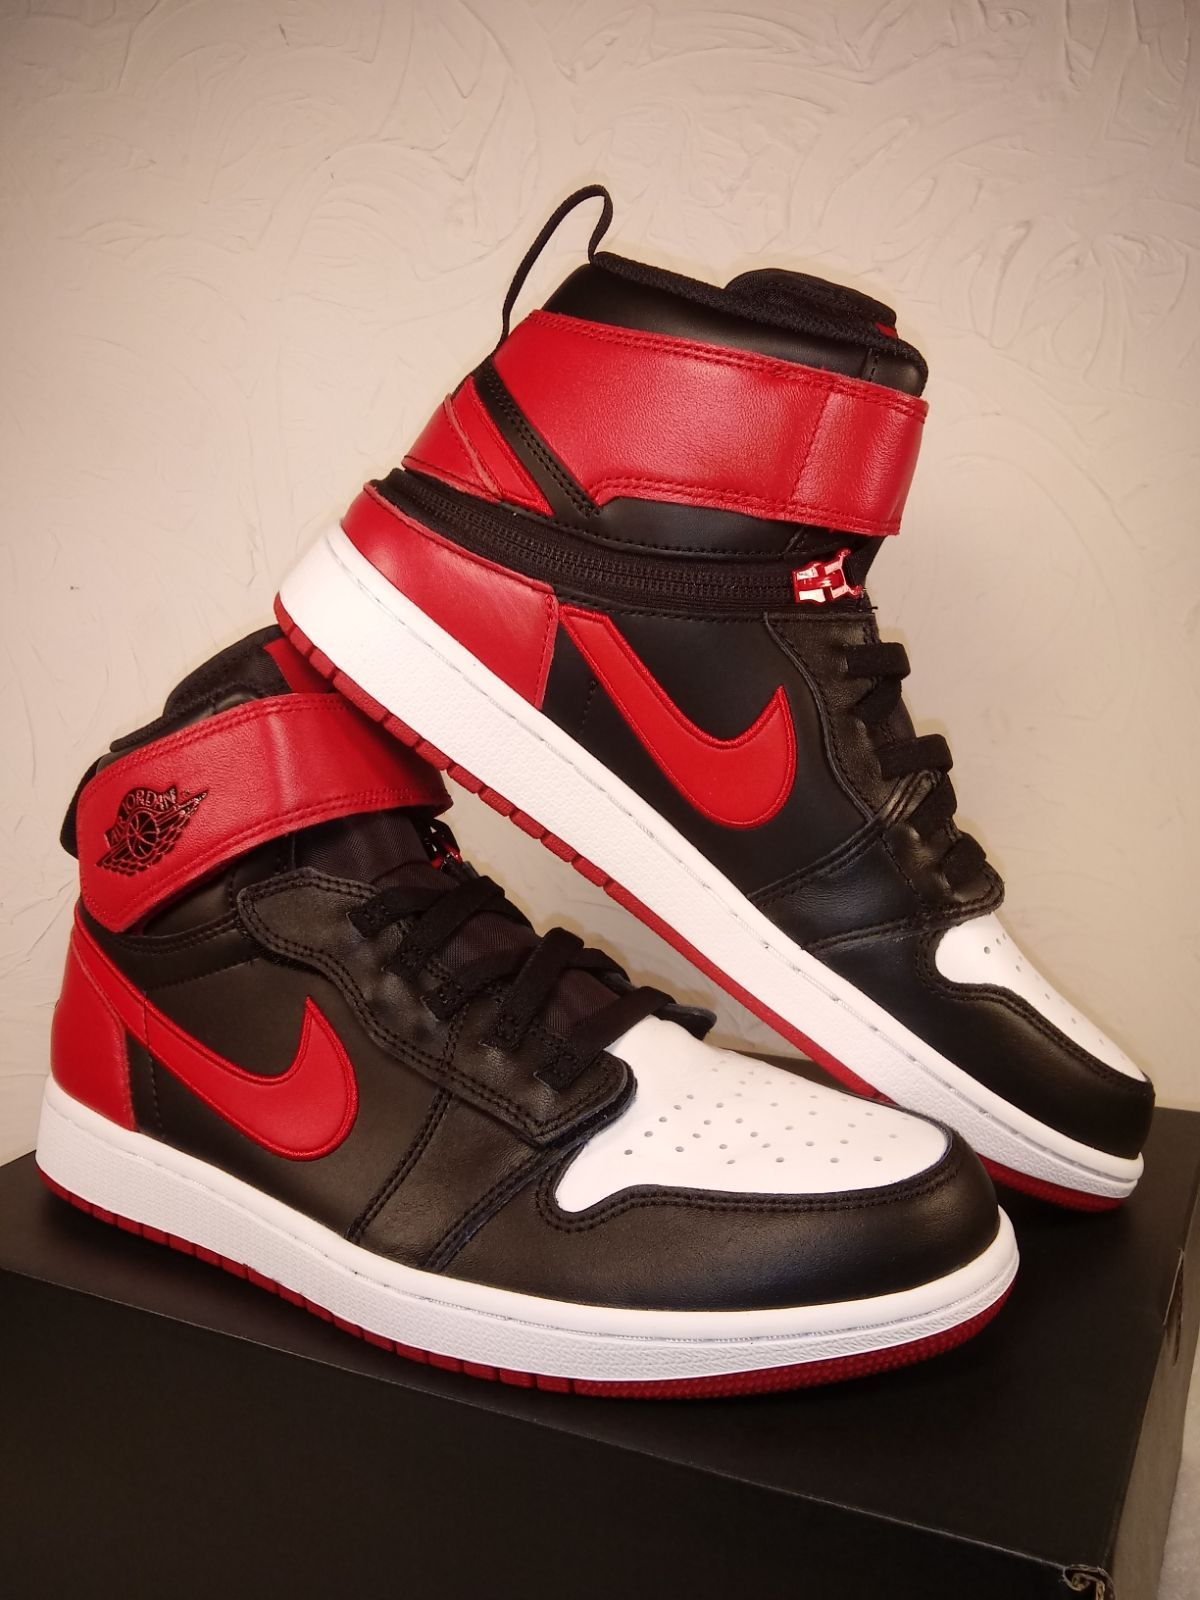 Air Jordan 1 High Fly Black Toe Size 10